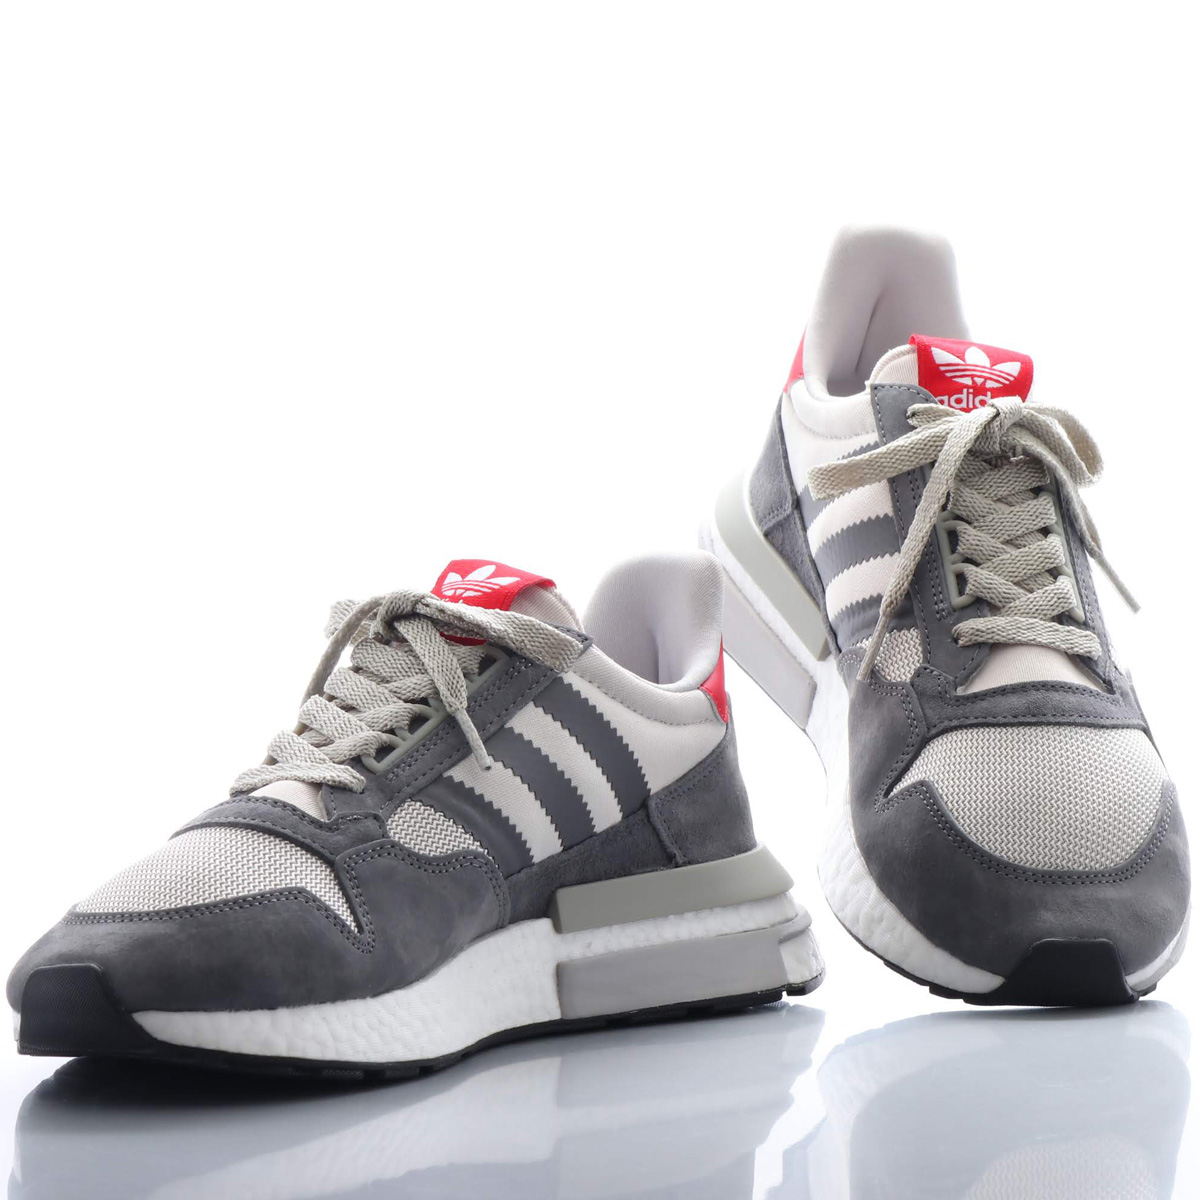 adidas Originals ZX 500 RM(アディダス オリジナルス ZX 500 RM)GREY/RUNNING WHITE/SCARLET【メンズ スニーカー】18FW-I